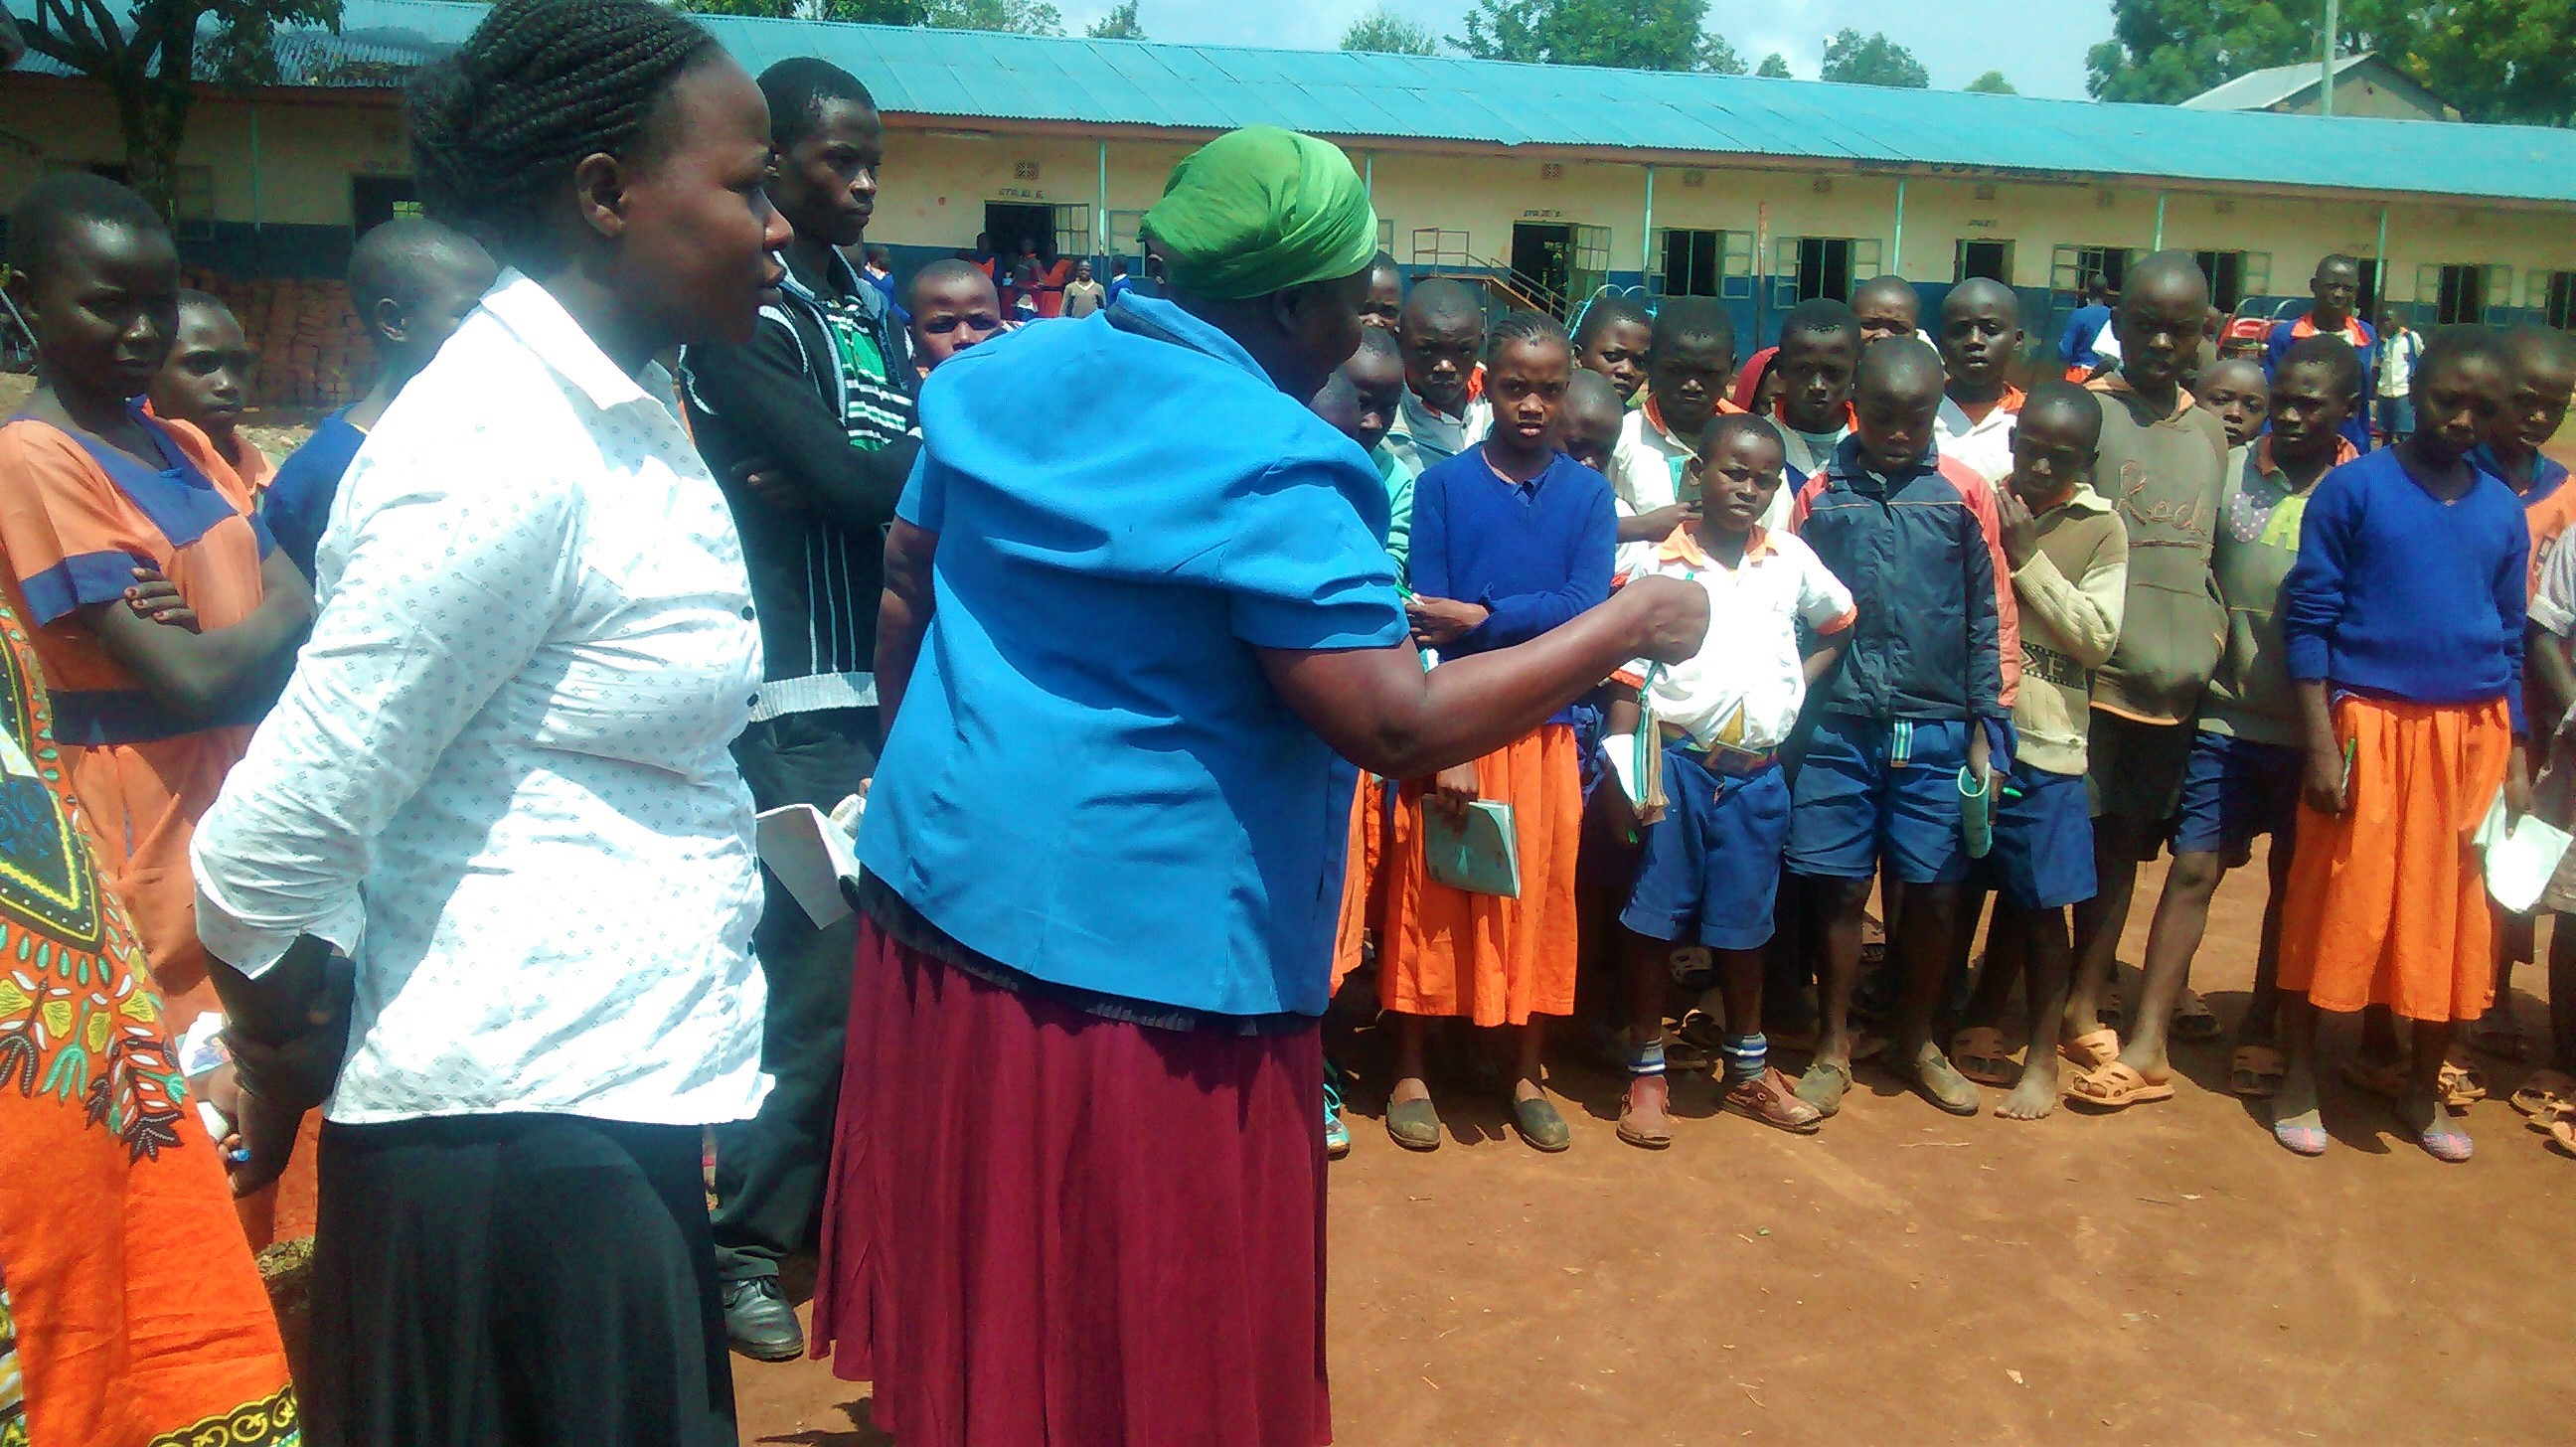 6 kenya4674 sanitation teacher talking to students